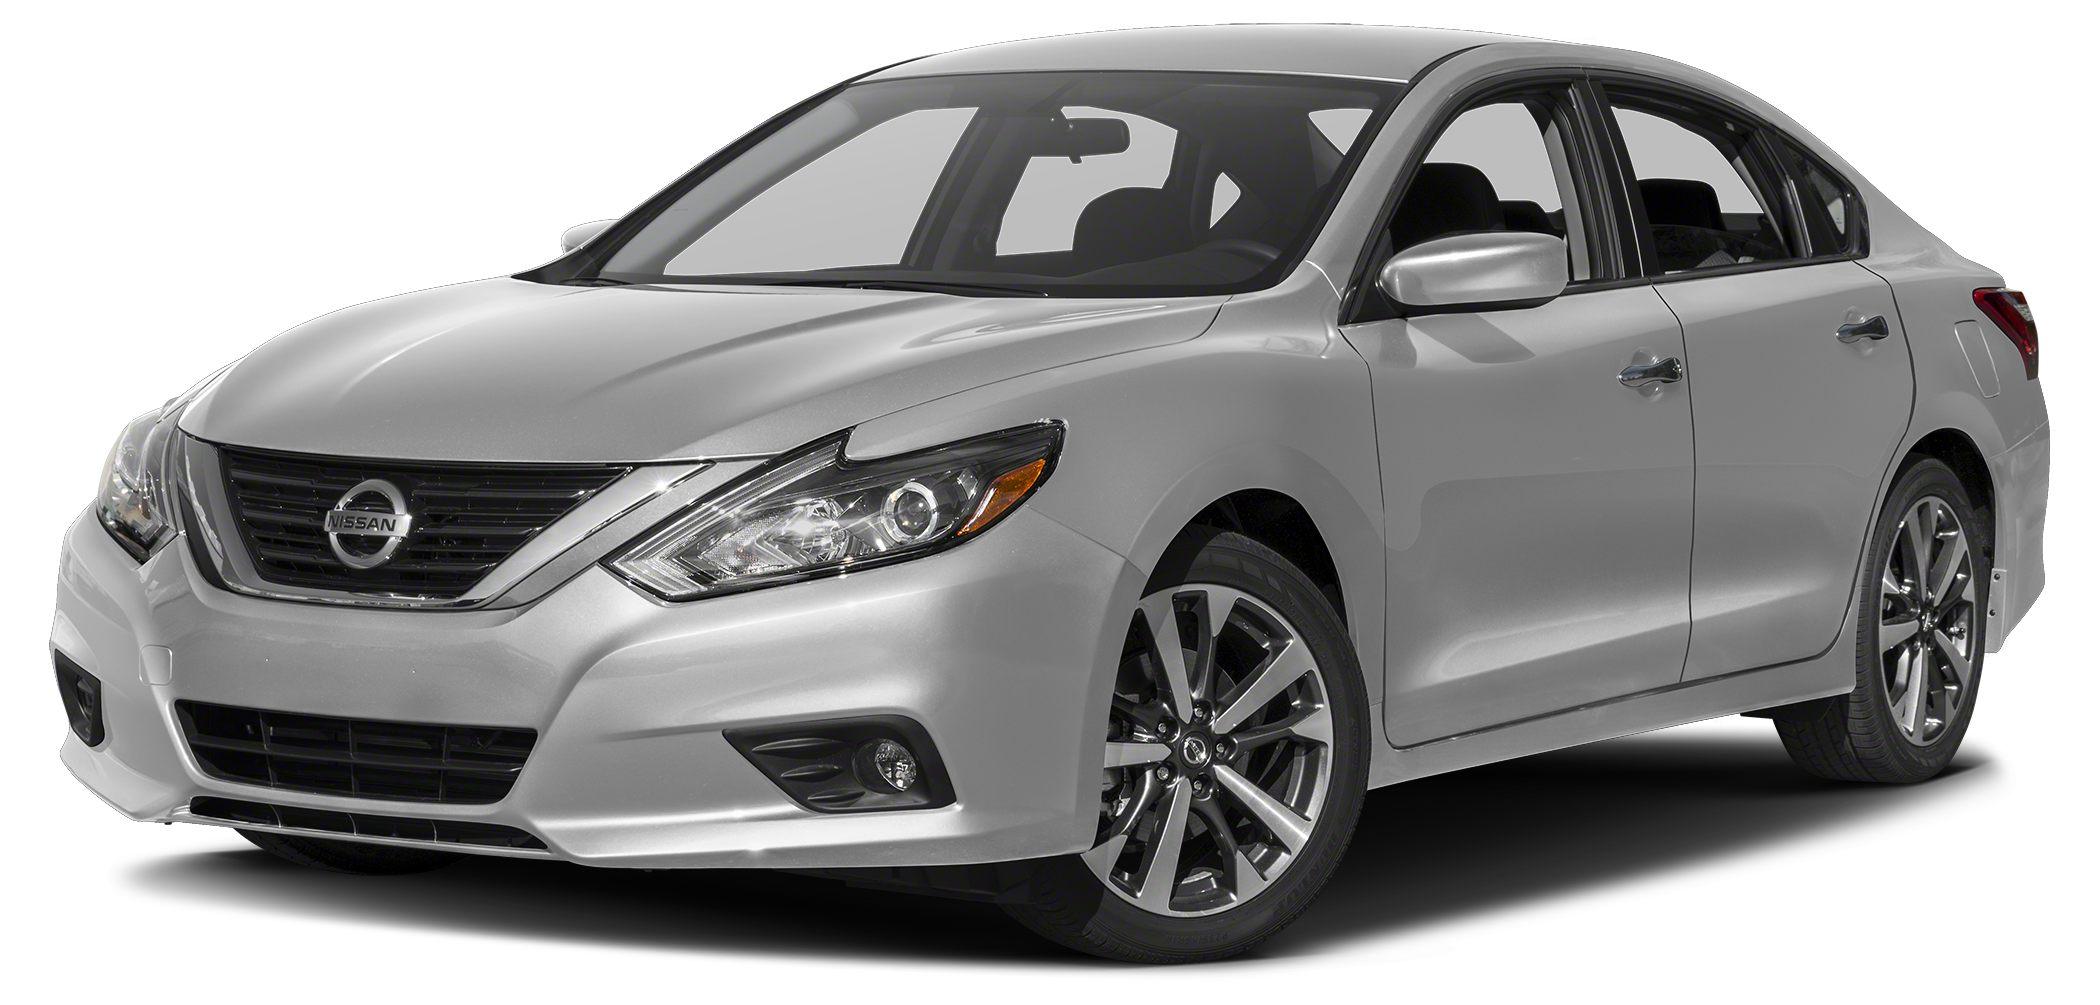 2017 Nissan Altima 25 SR Miles 9Color Brilliant Silver Stock 17AL125 VIN 1N4AL3AP0HC119319